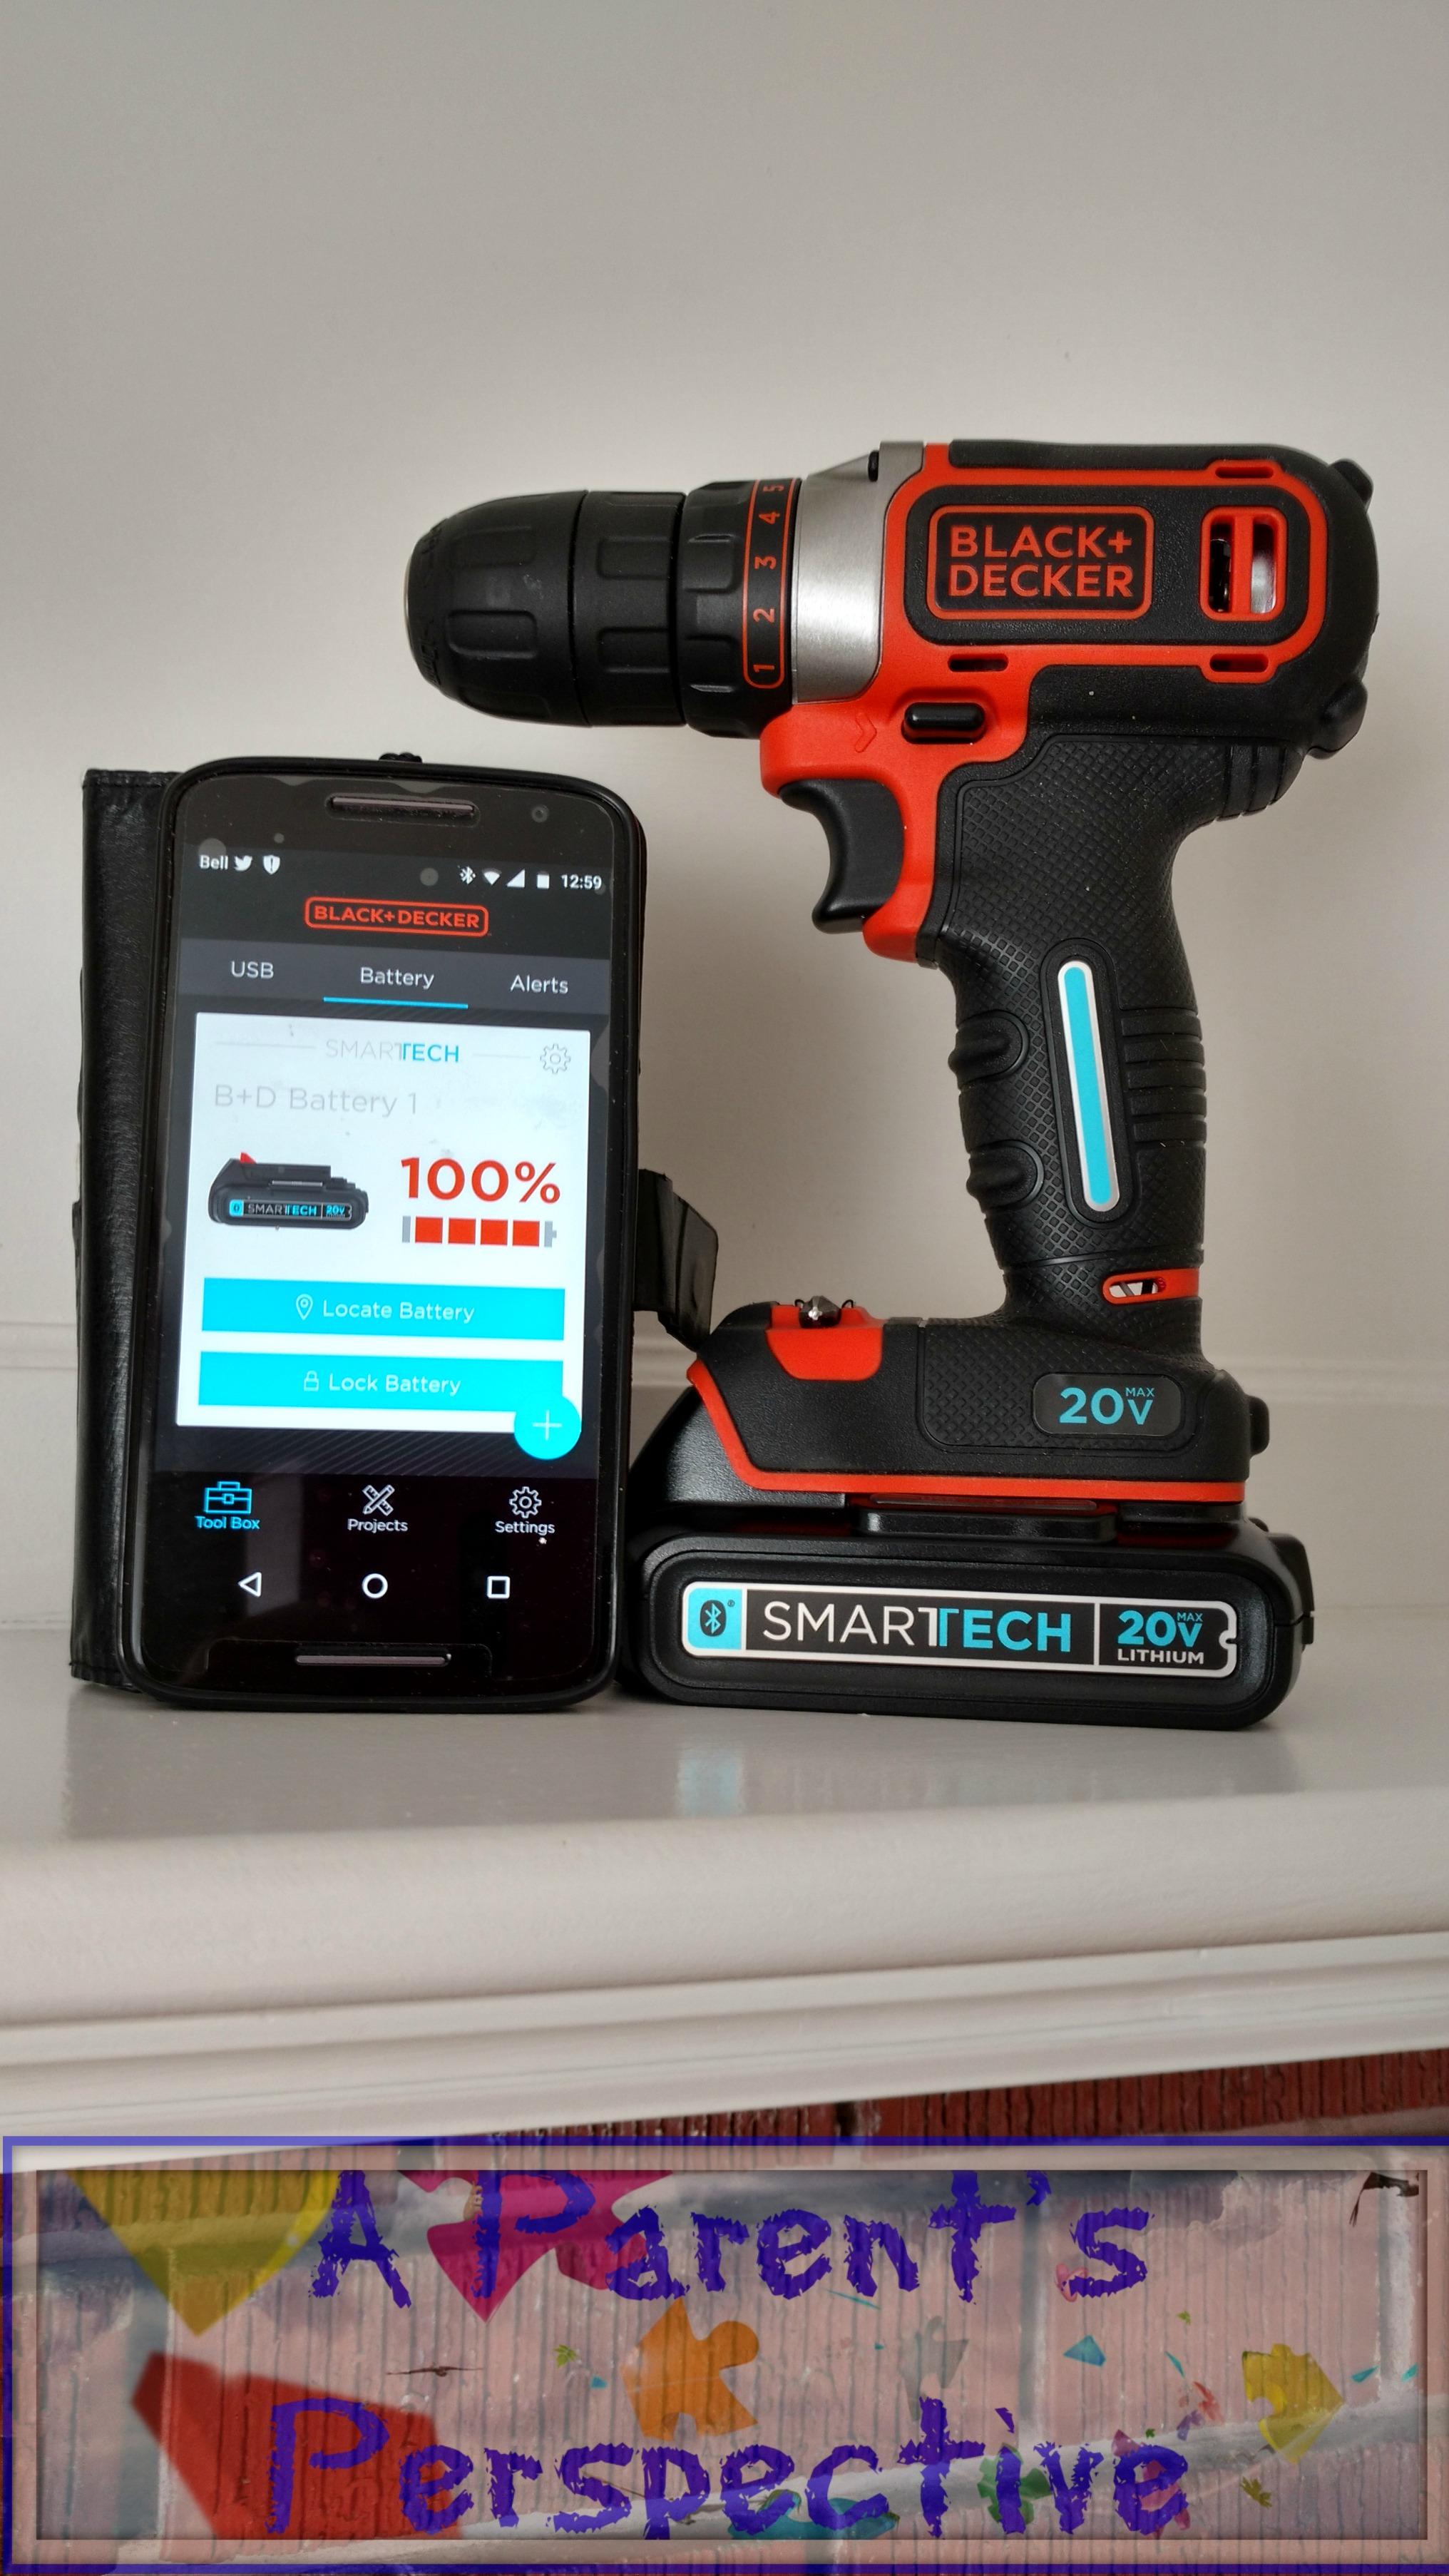 Black+Decker 20V Smartech Drill